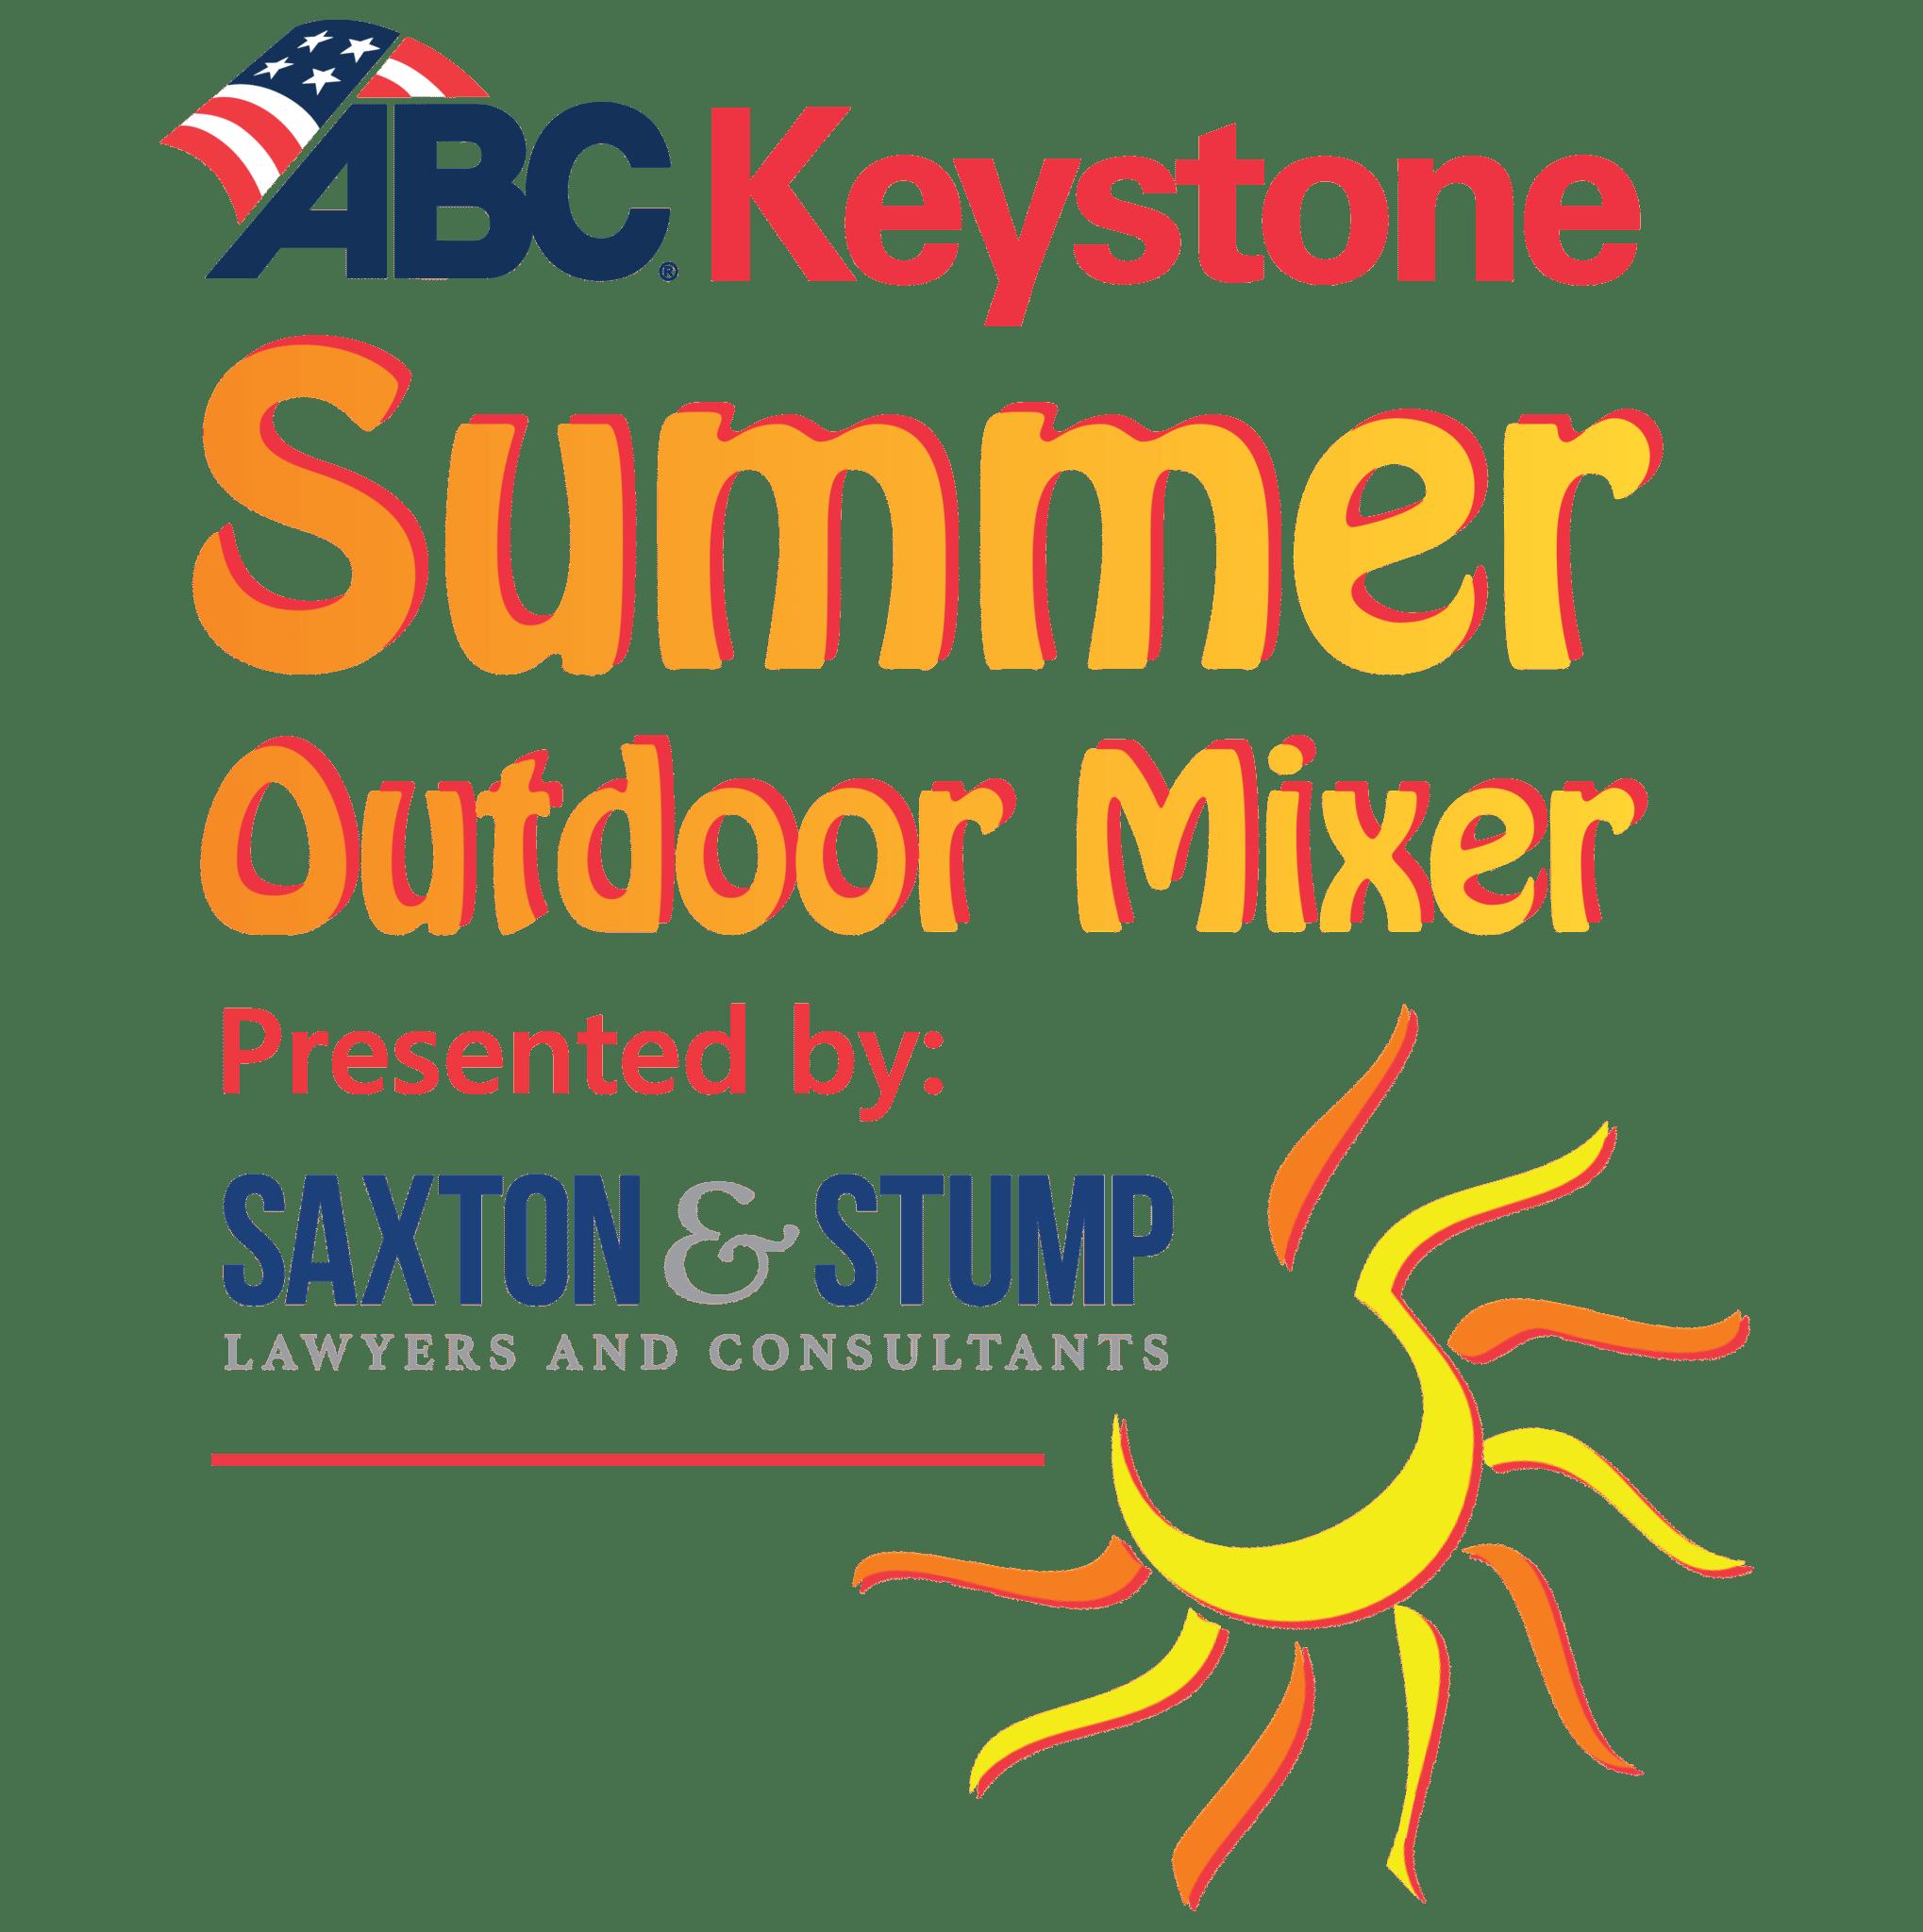 ABC Keystone Summer Outdoor Mixer presented by Saxton & Stump LLC